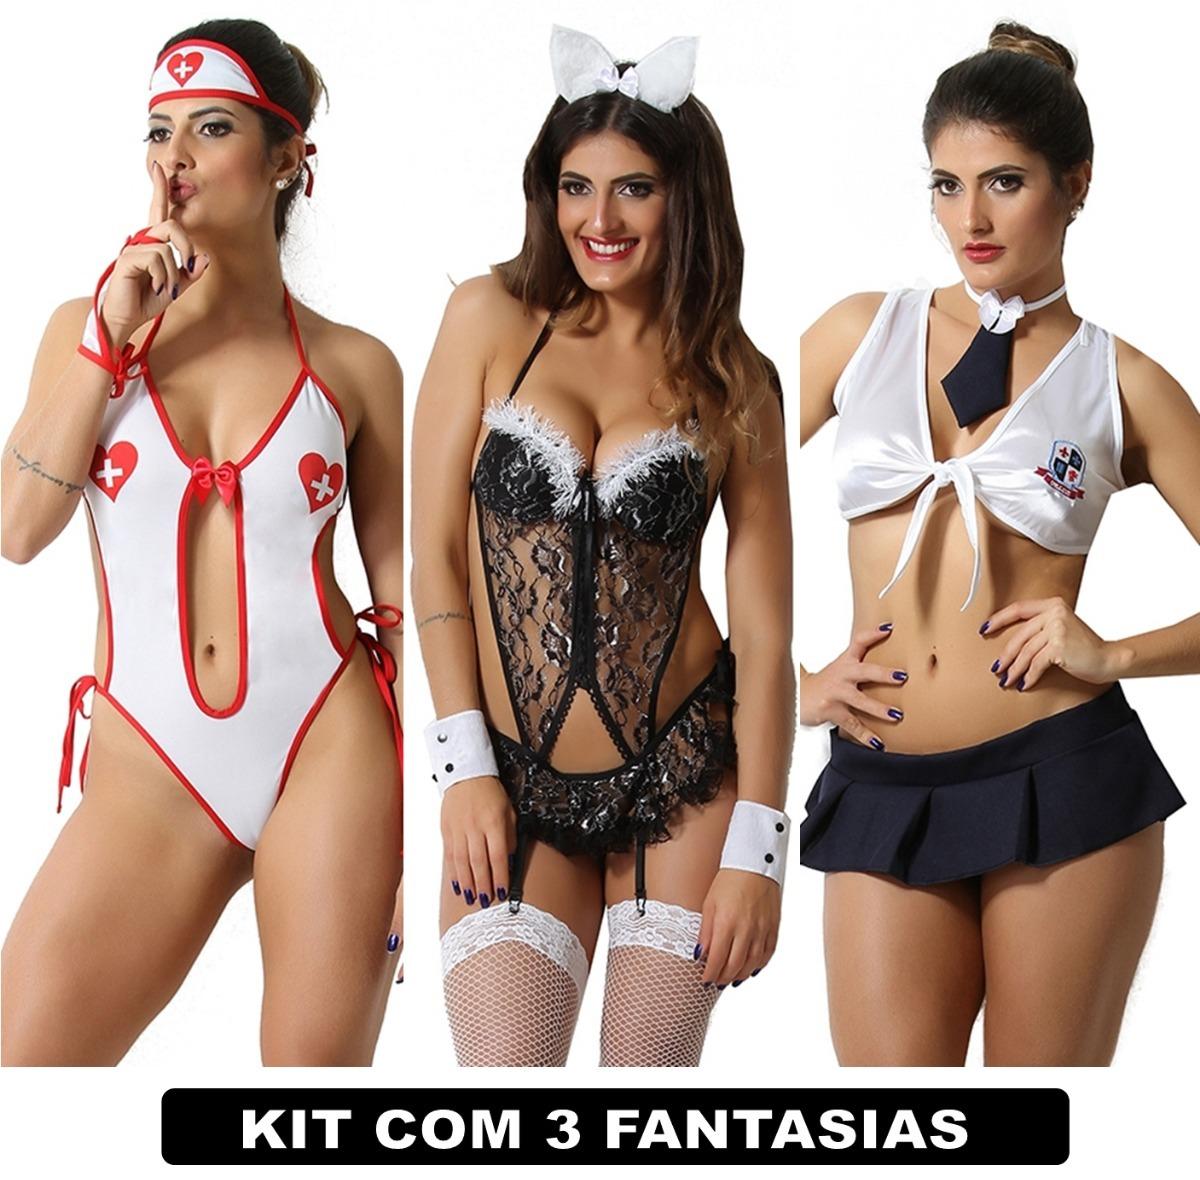 35d772970 Carregando zoom... conjuntos lingerie sexy atacado com 3 uni fantasias  eroticas